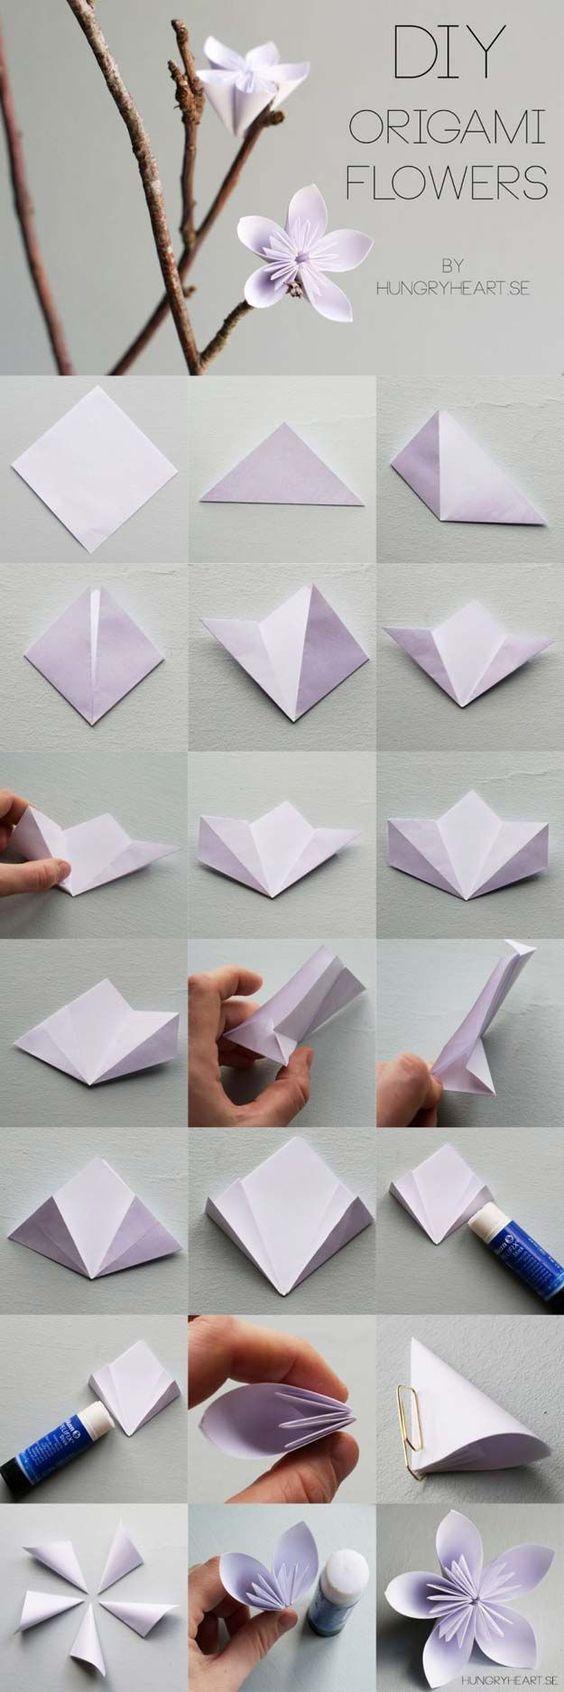 Best Origami Tutorials Flower Origami Easy Diy Origami Tutorial